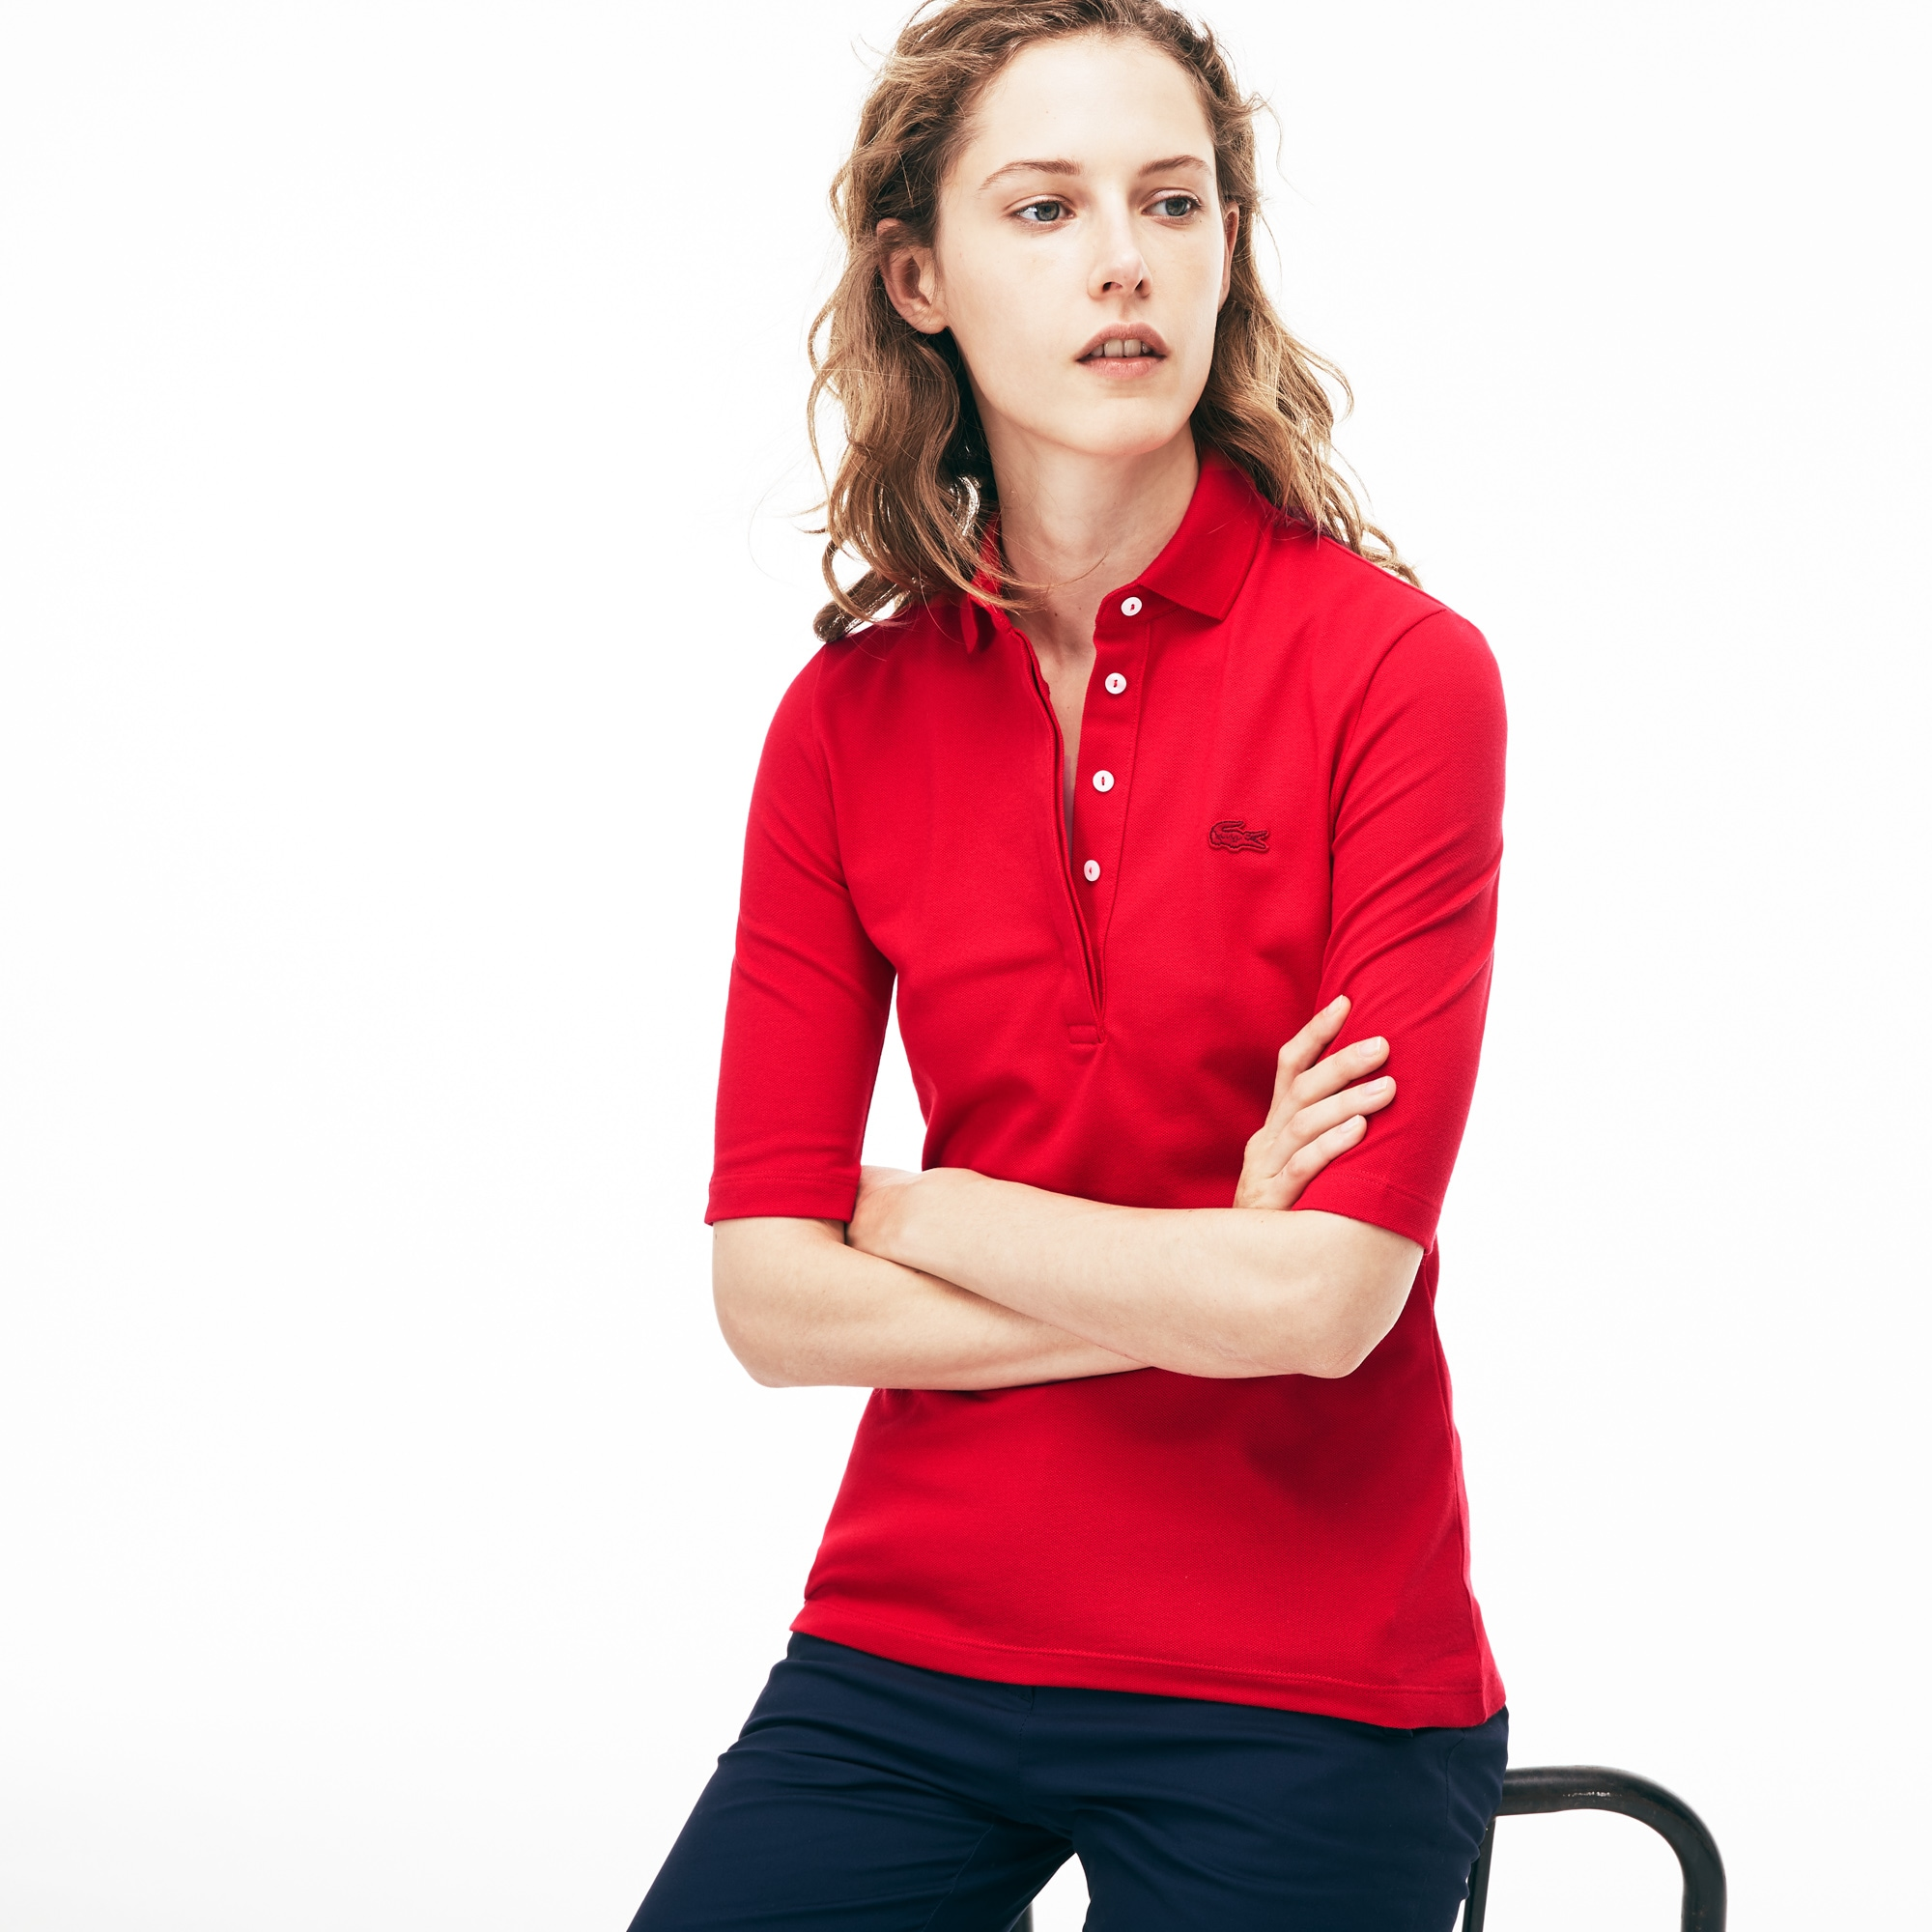 Lacoste Women S Slim Fit Stretch Mini PiquÉ Polo Shirt In Toreador ... 0865eb1dd1